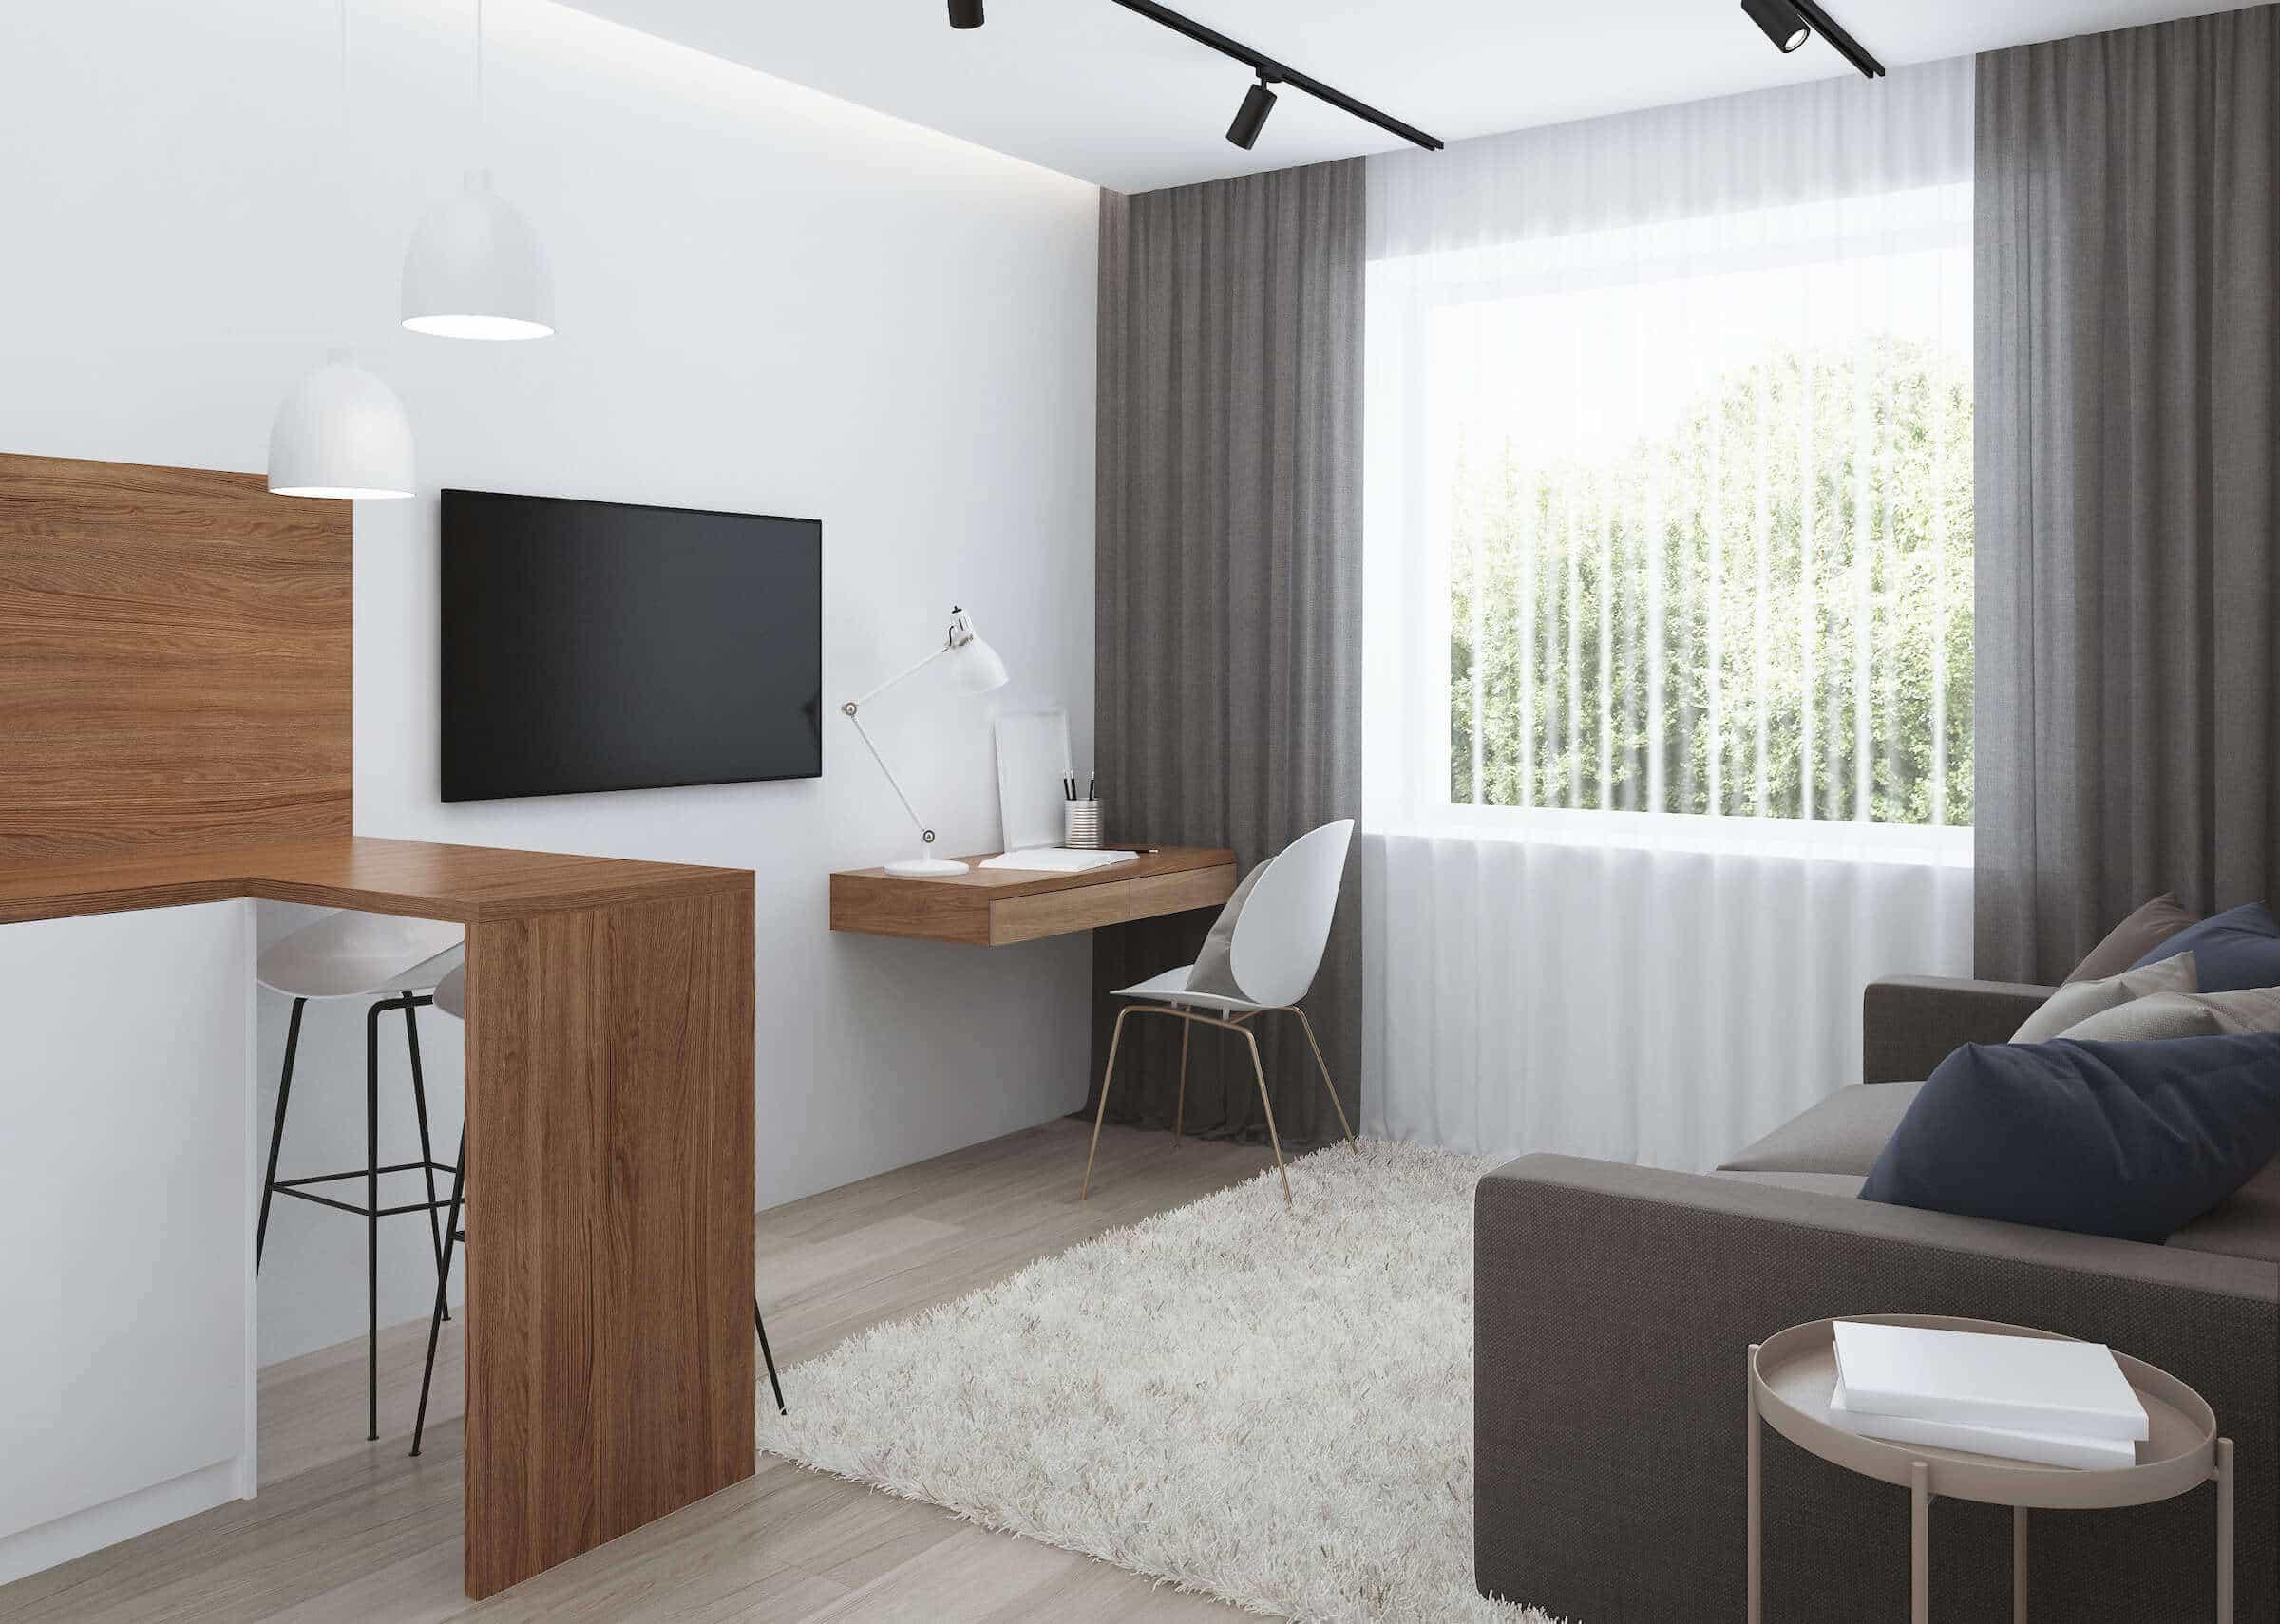 Latest Trends of Small House Interior Design Ideas   Live Enhanced